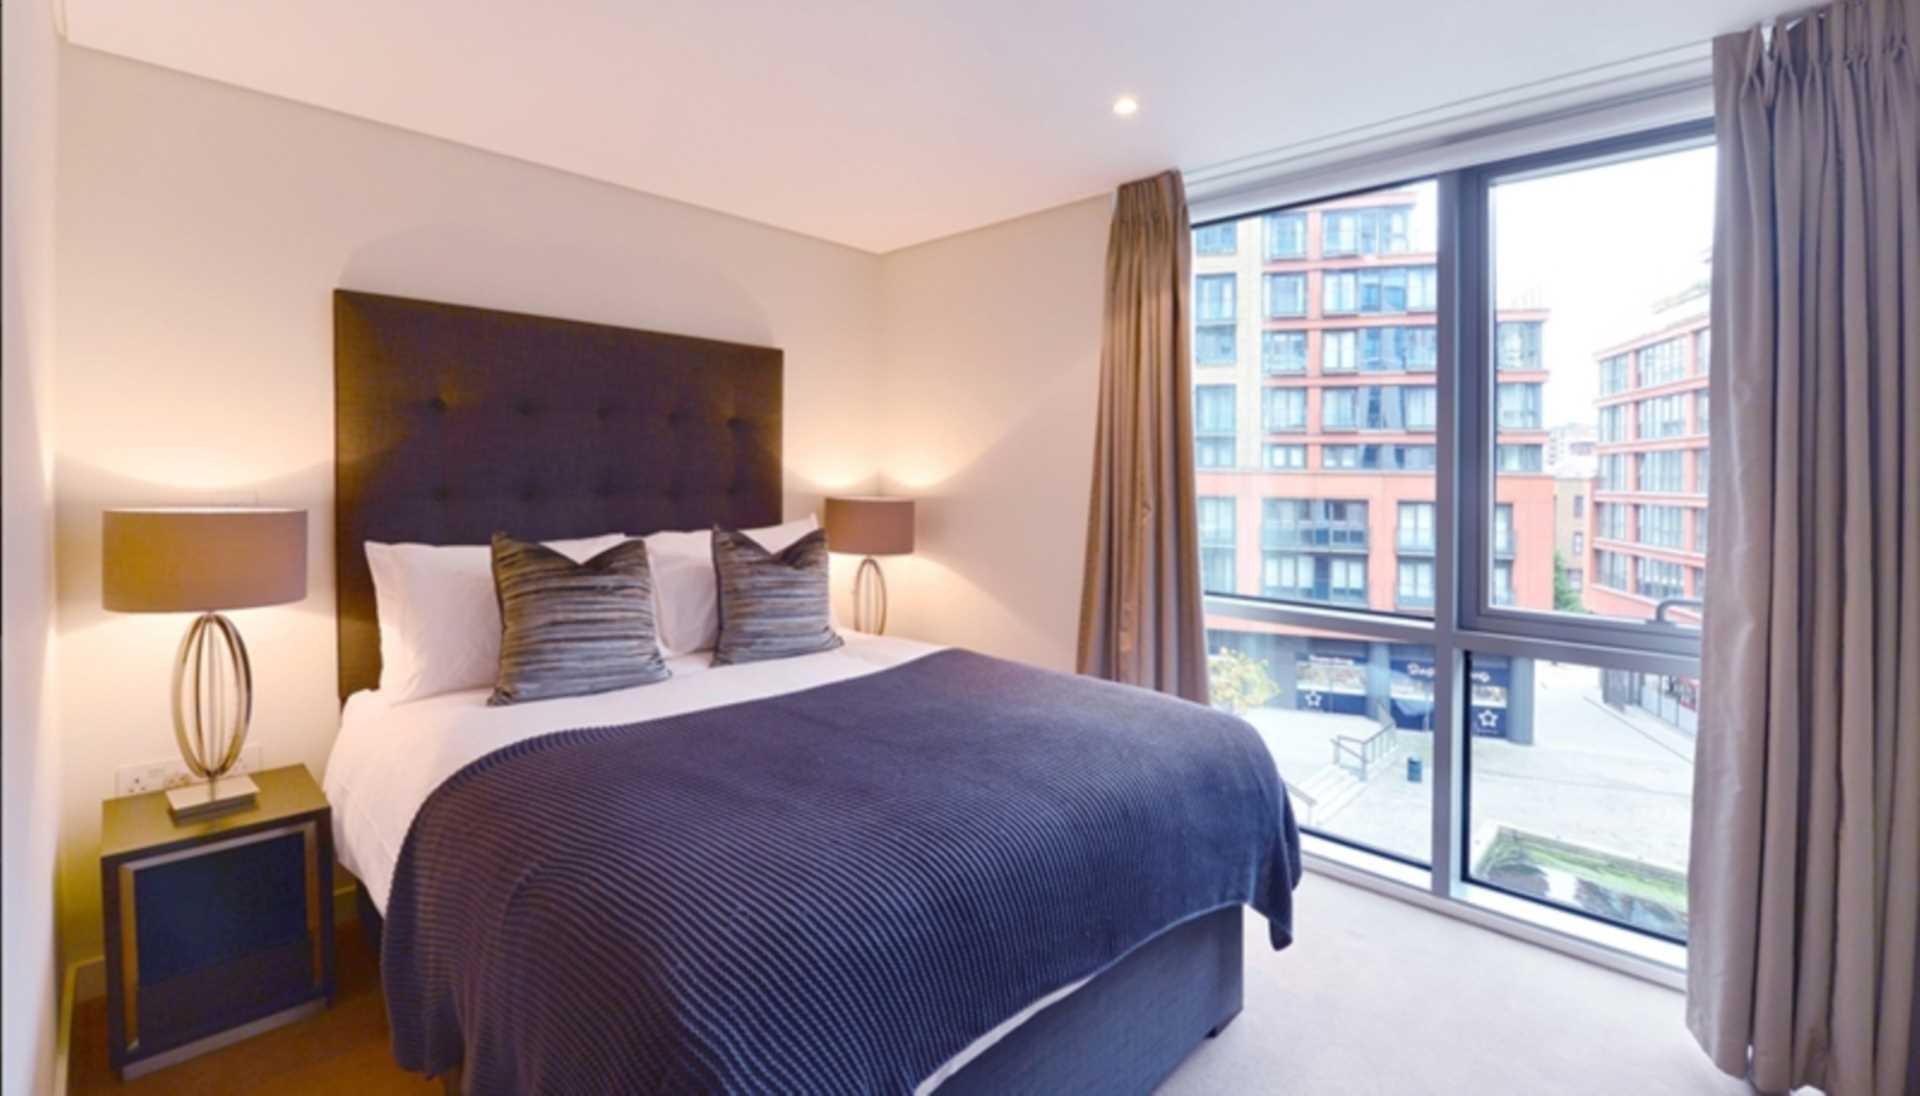 3 Bedroom Apartment To Rent Water Views Merchant Square Paddington London W2 1an